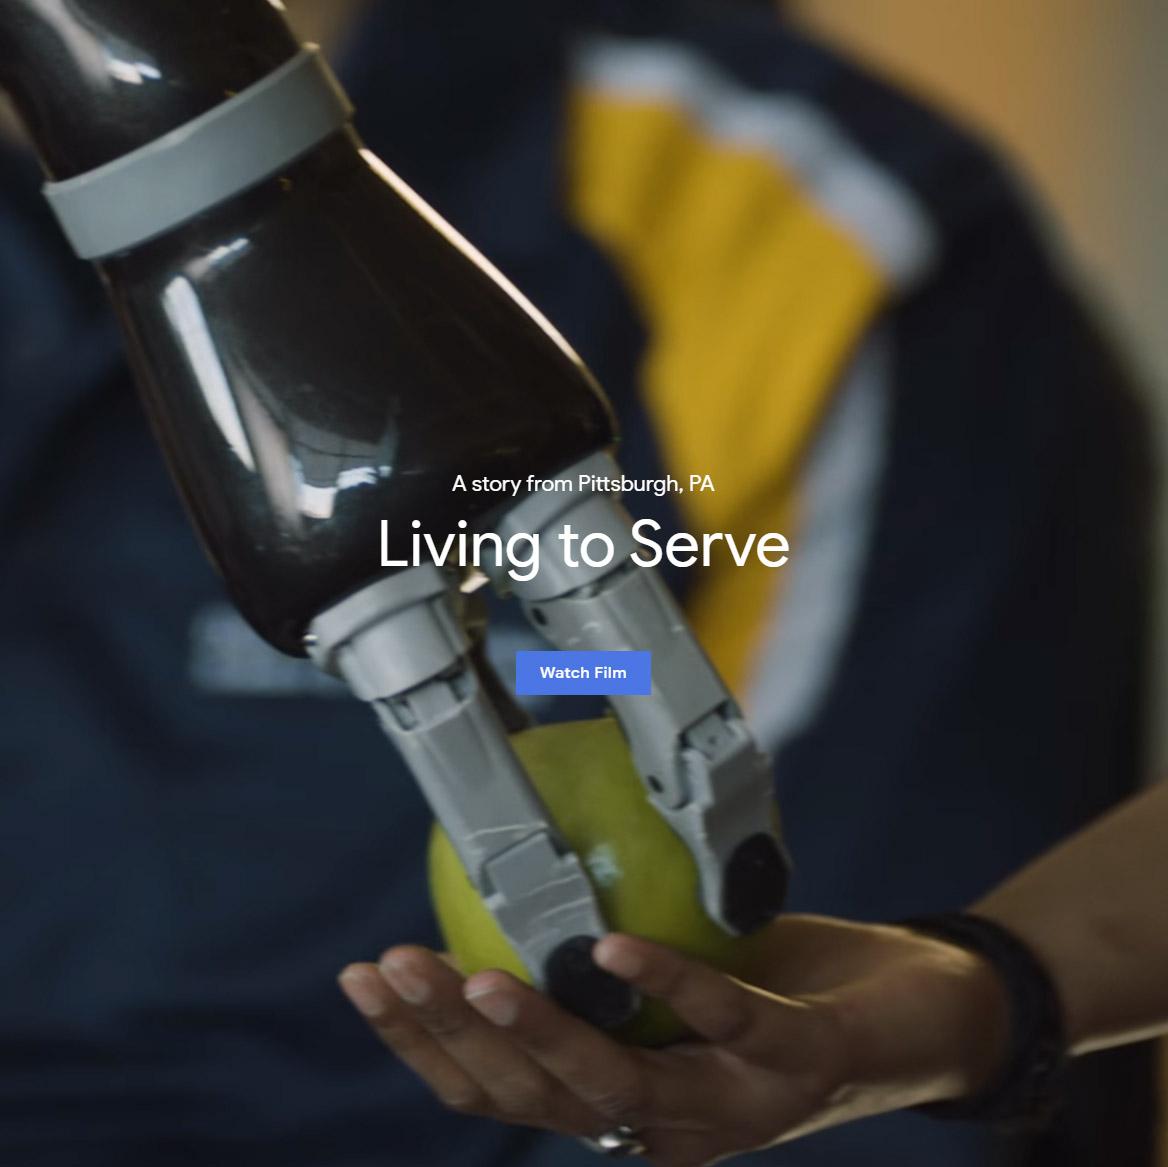 Living to Serve (link)